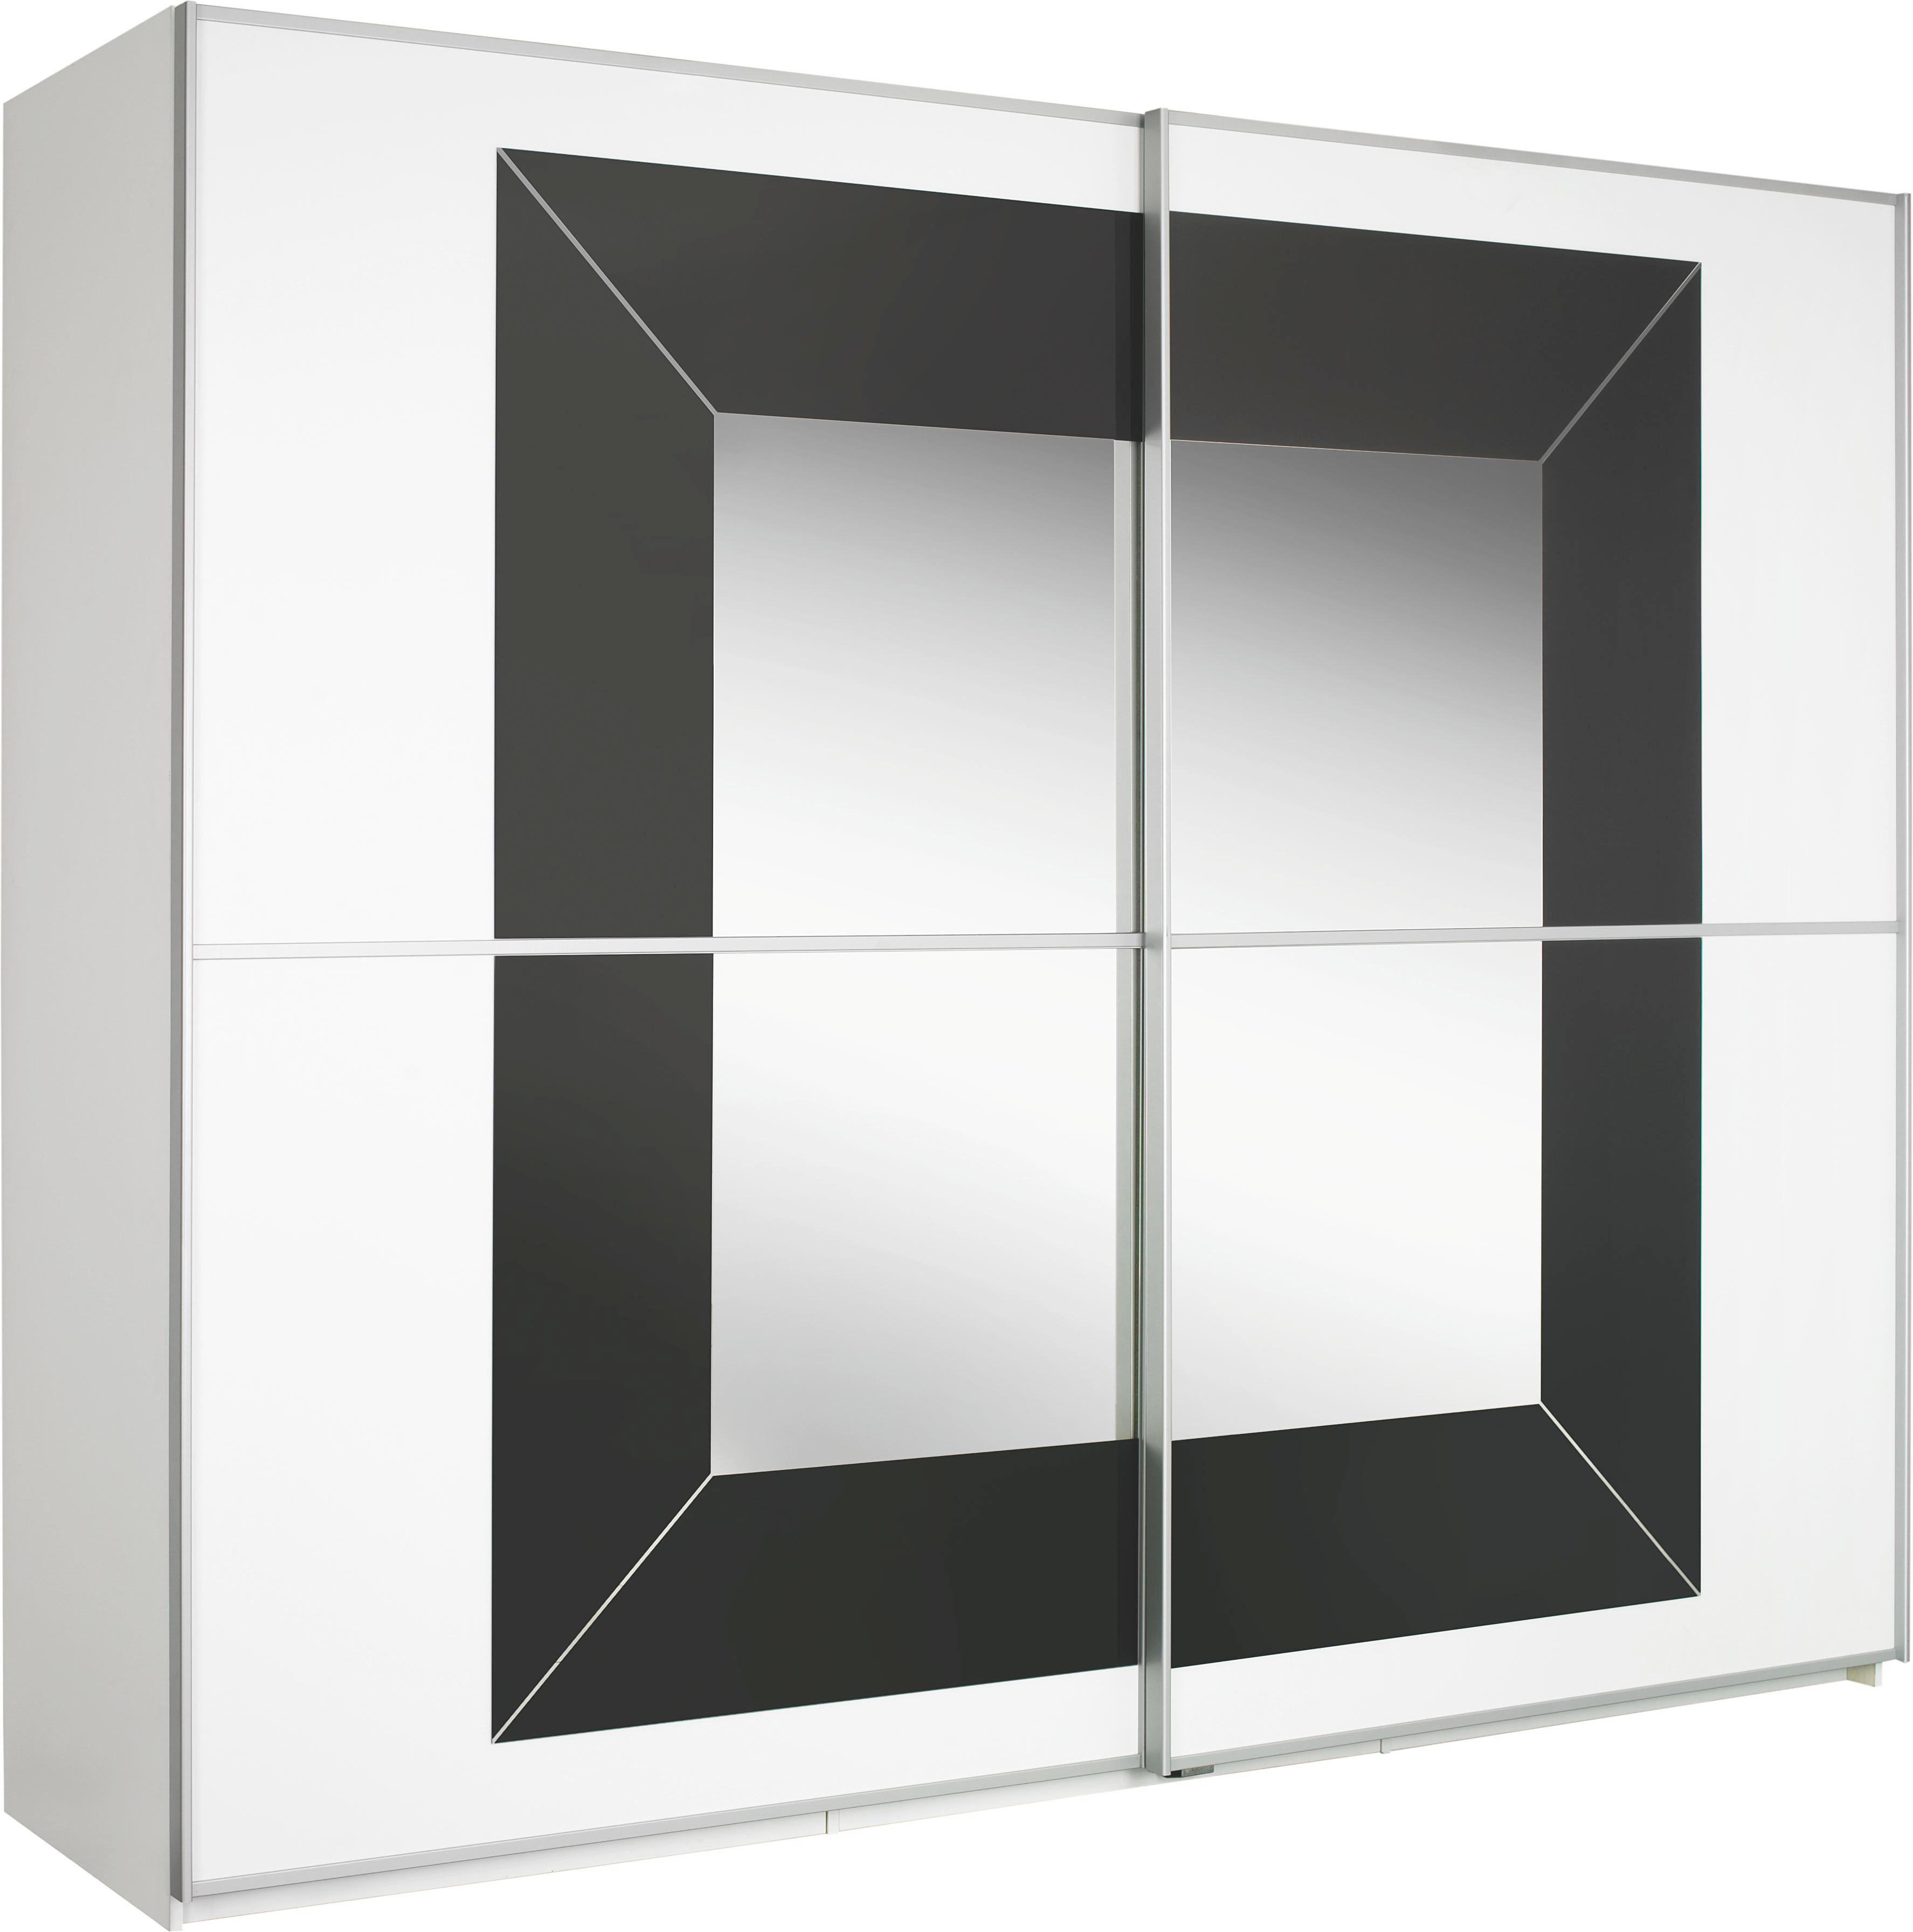 SKŘÍŇ S POSUVNÝMI DVEŘMI - bílá/šedá, Design, kov/dřevěný materiál (270/223/69cm) - CANTUS